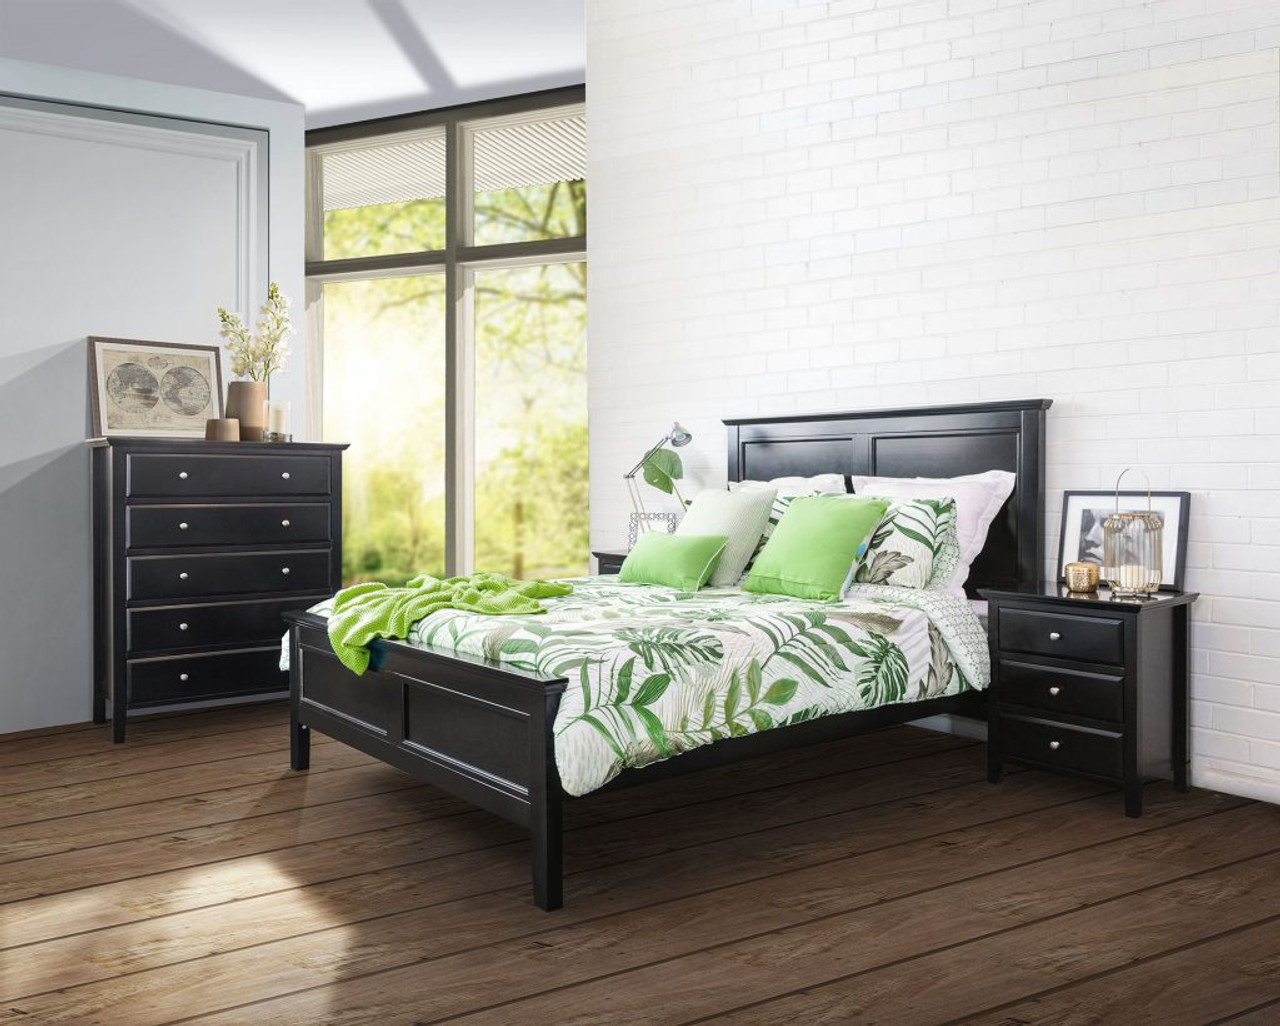 Ballina Double Or Queen 5 Piece Dresser Bedroom Suite Black My Furniture Store Furniture And Bedding Super Store Australia